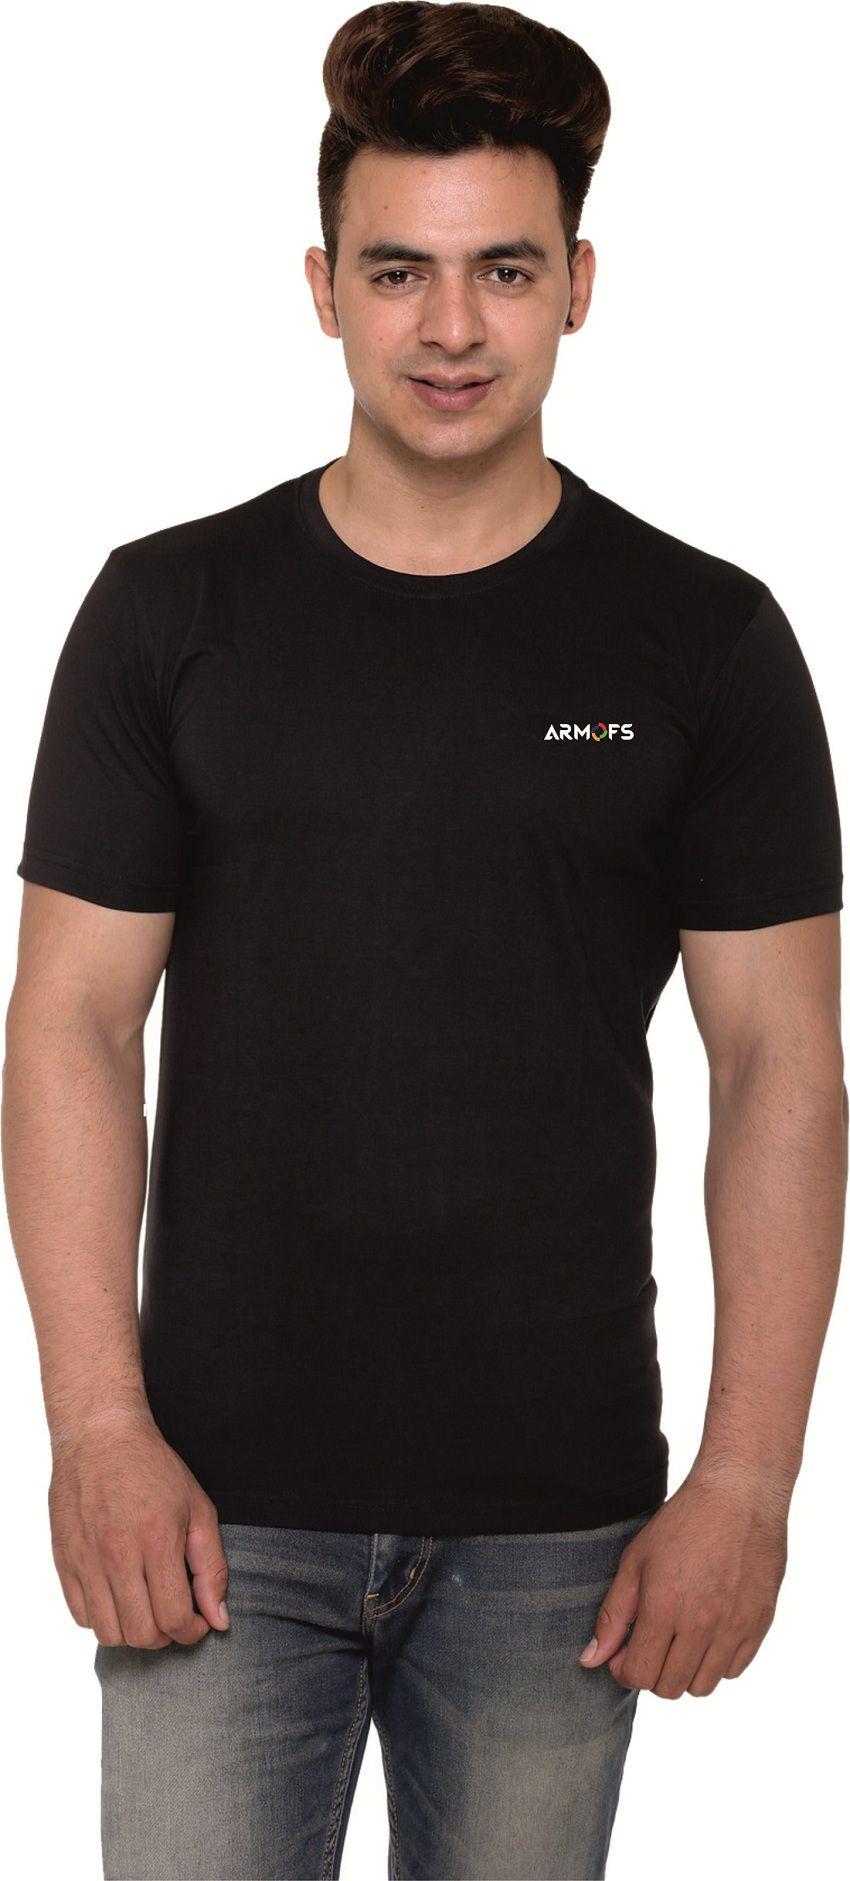 ARMOFS Black Round T-Shirt Pack of 1